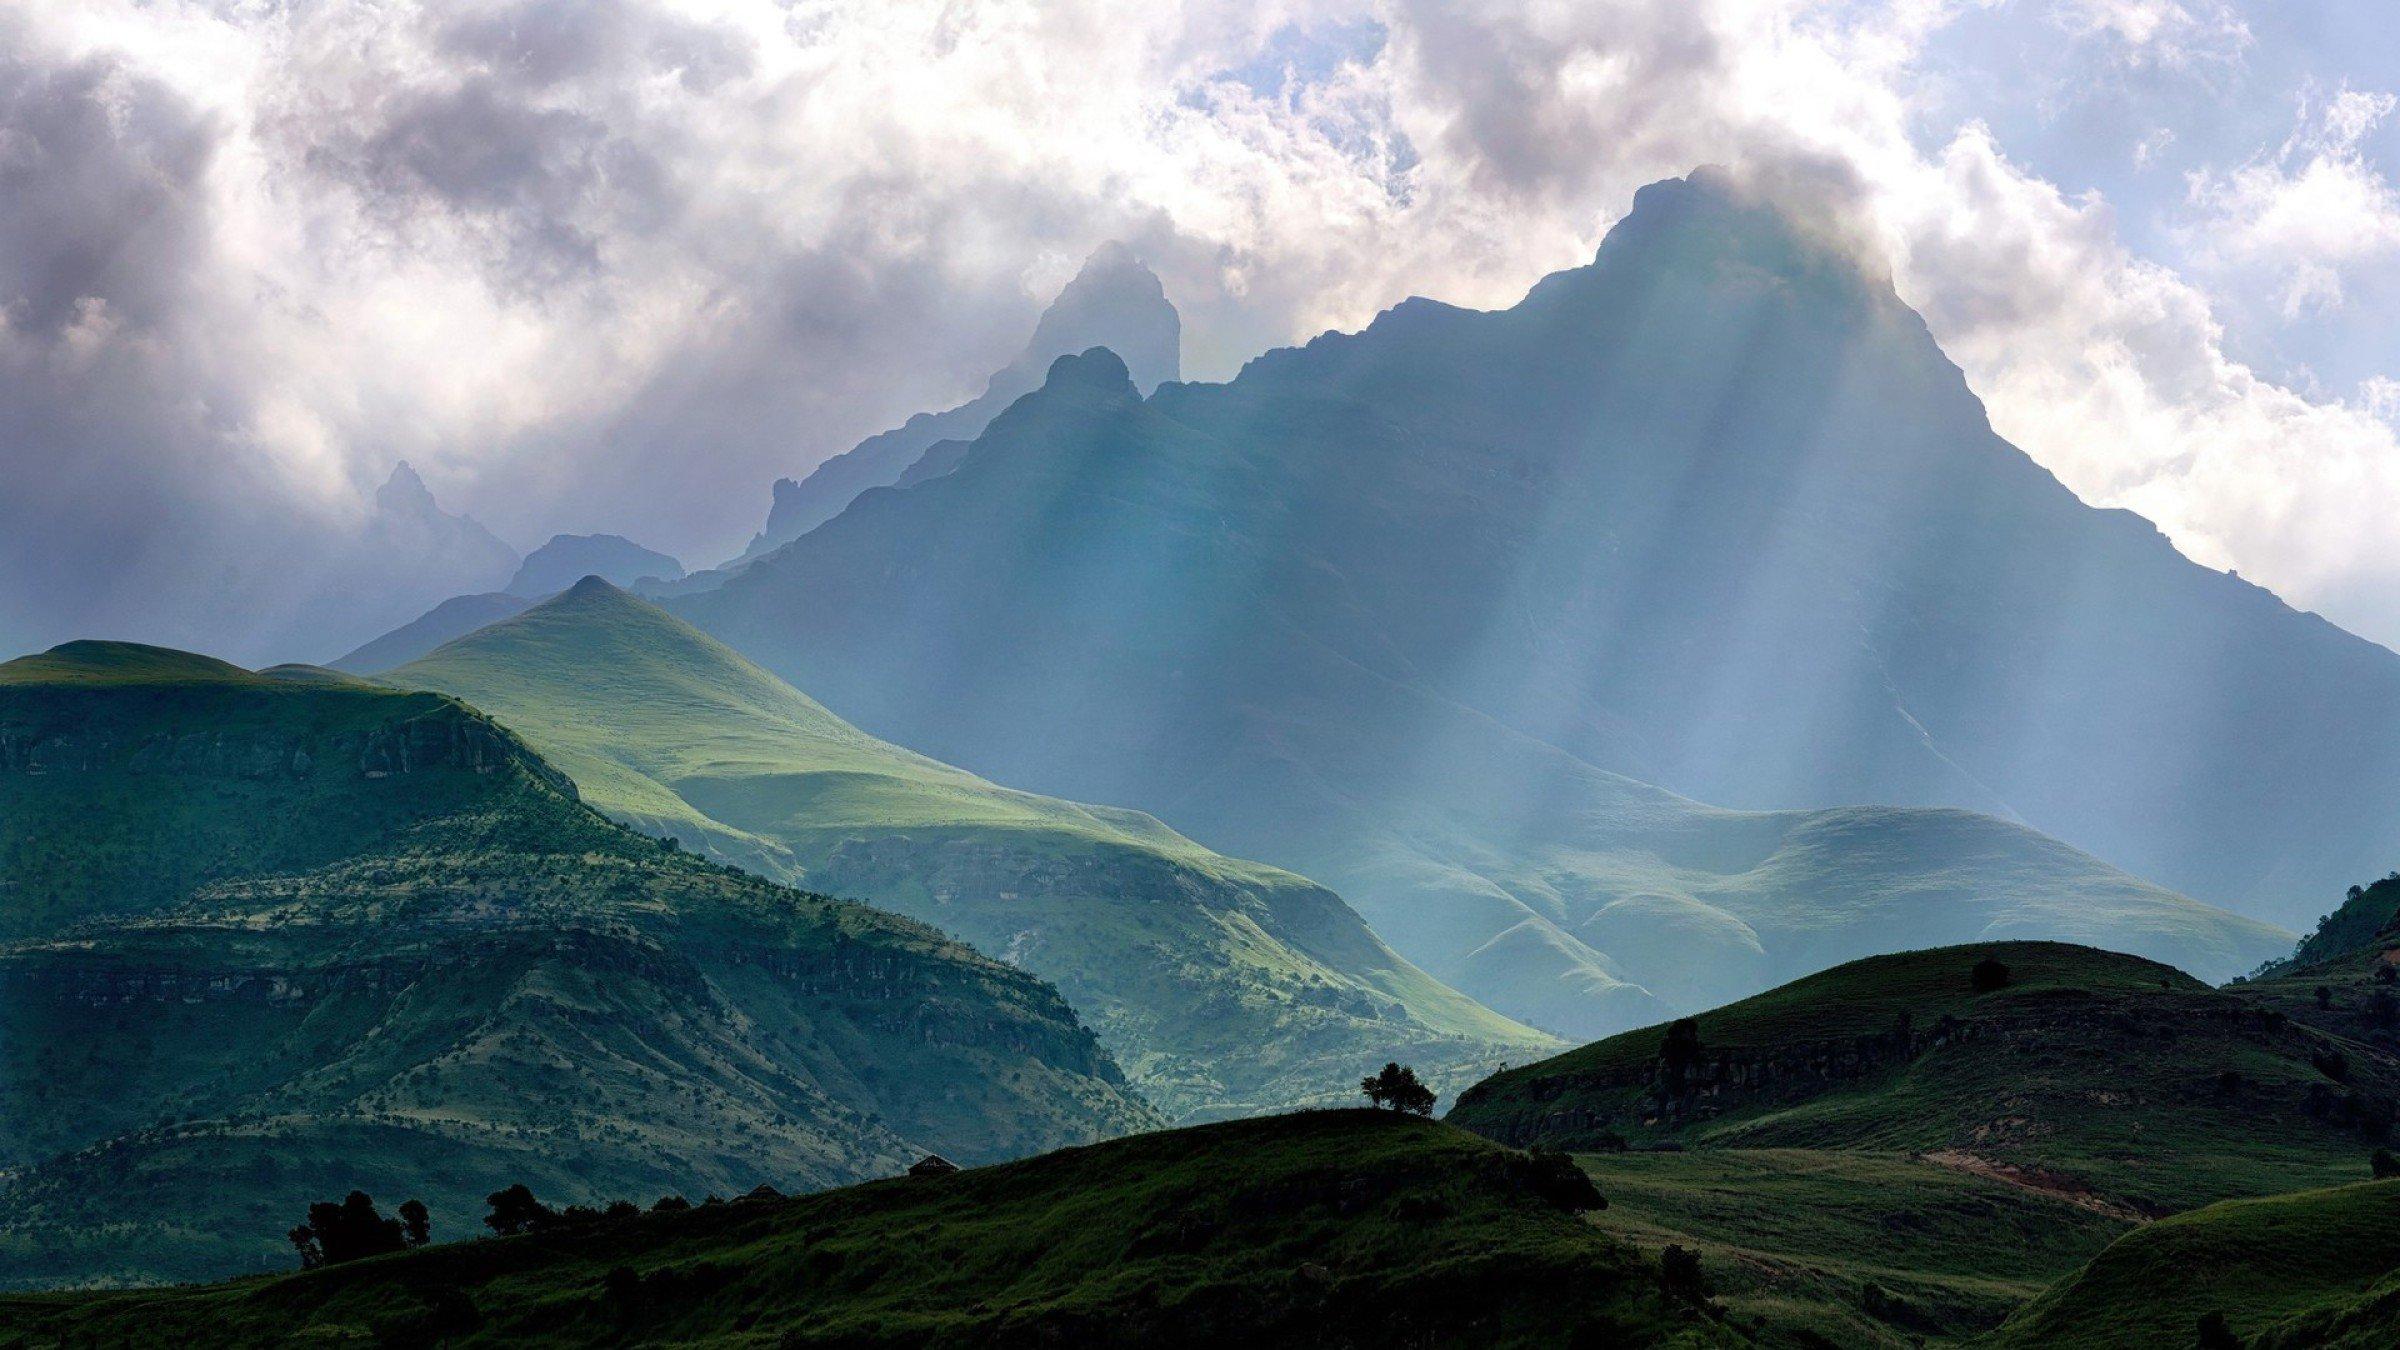 Mountains Landscape Nature Mountain Clouds Wallpaper